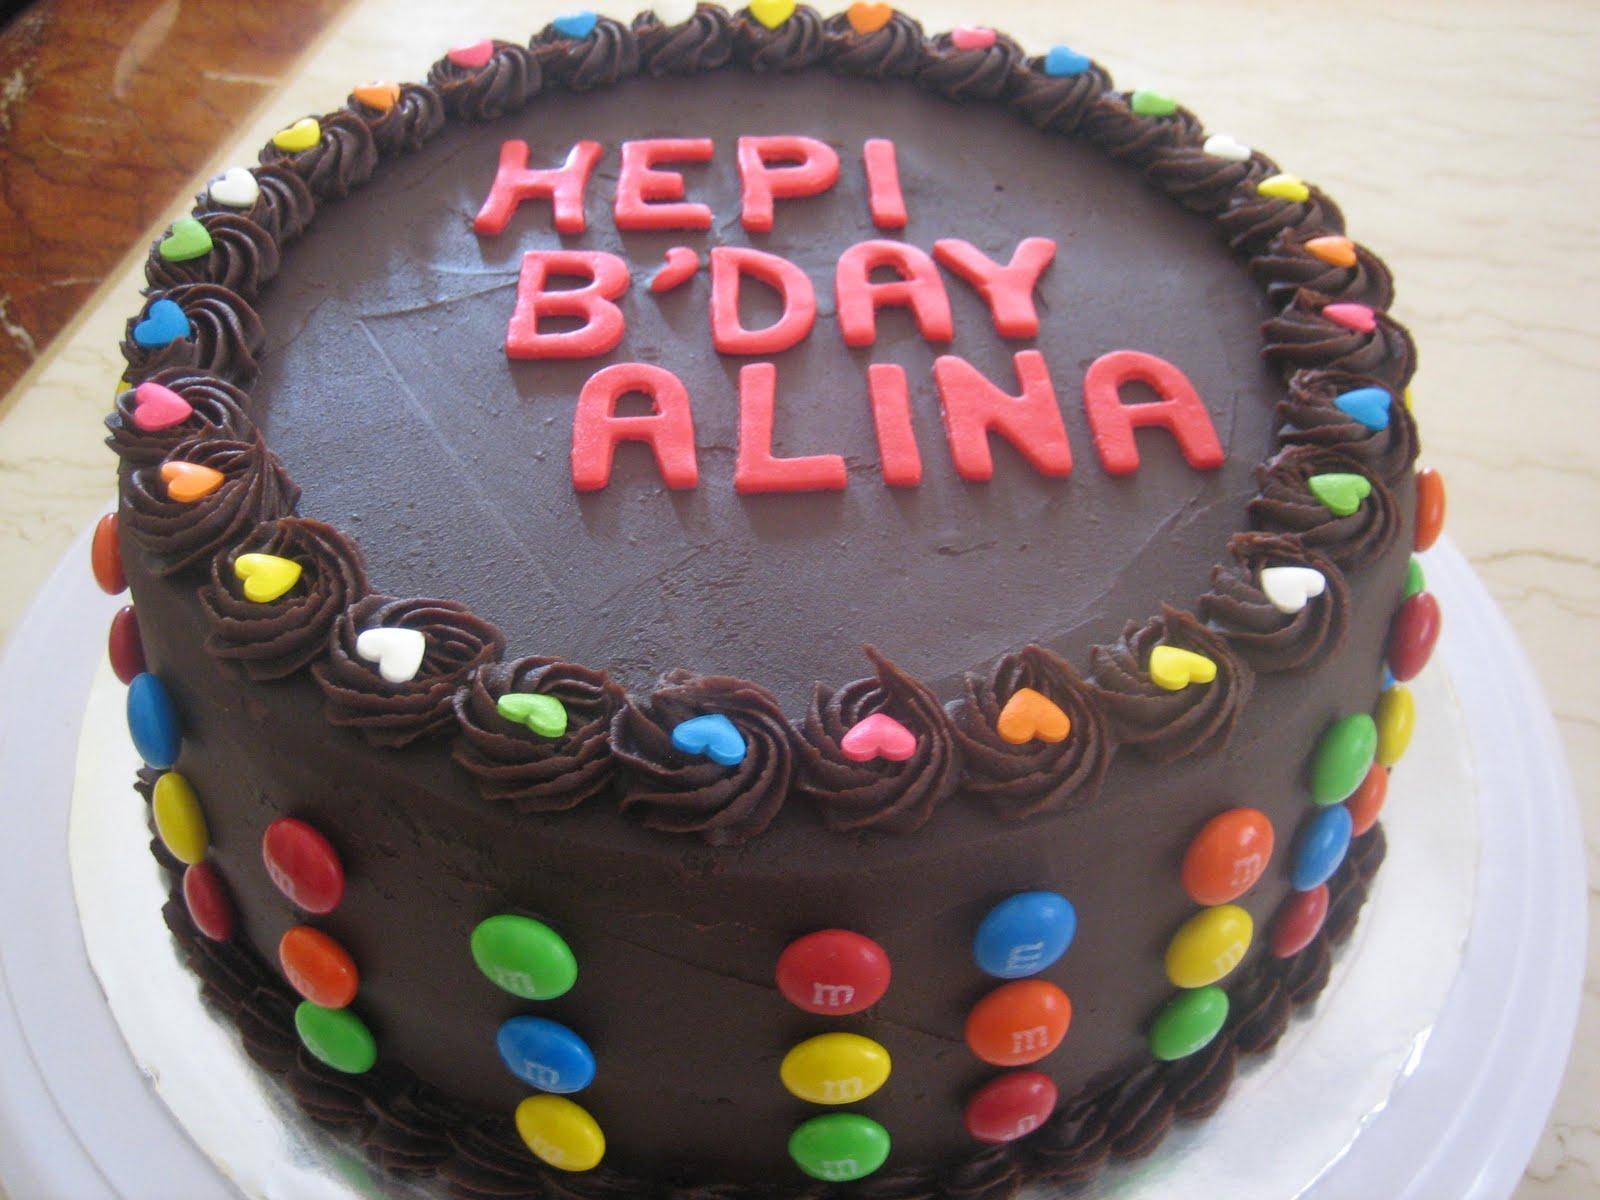 Simple Birthday Cake Ideas Homemade Image Inspiration of Cake and